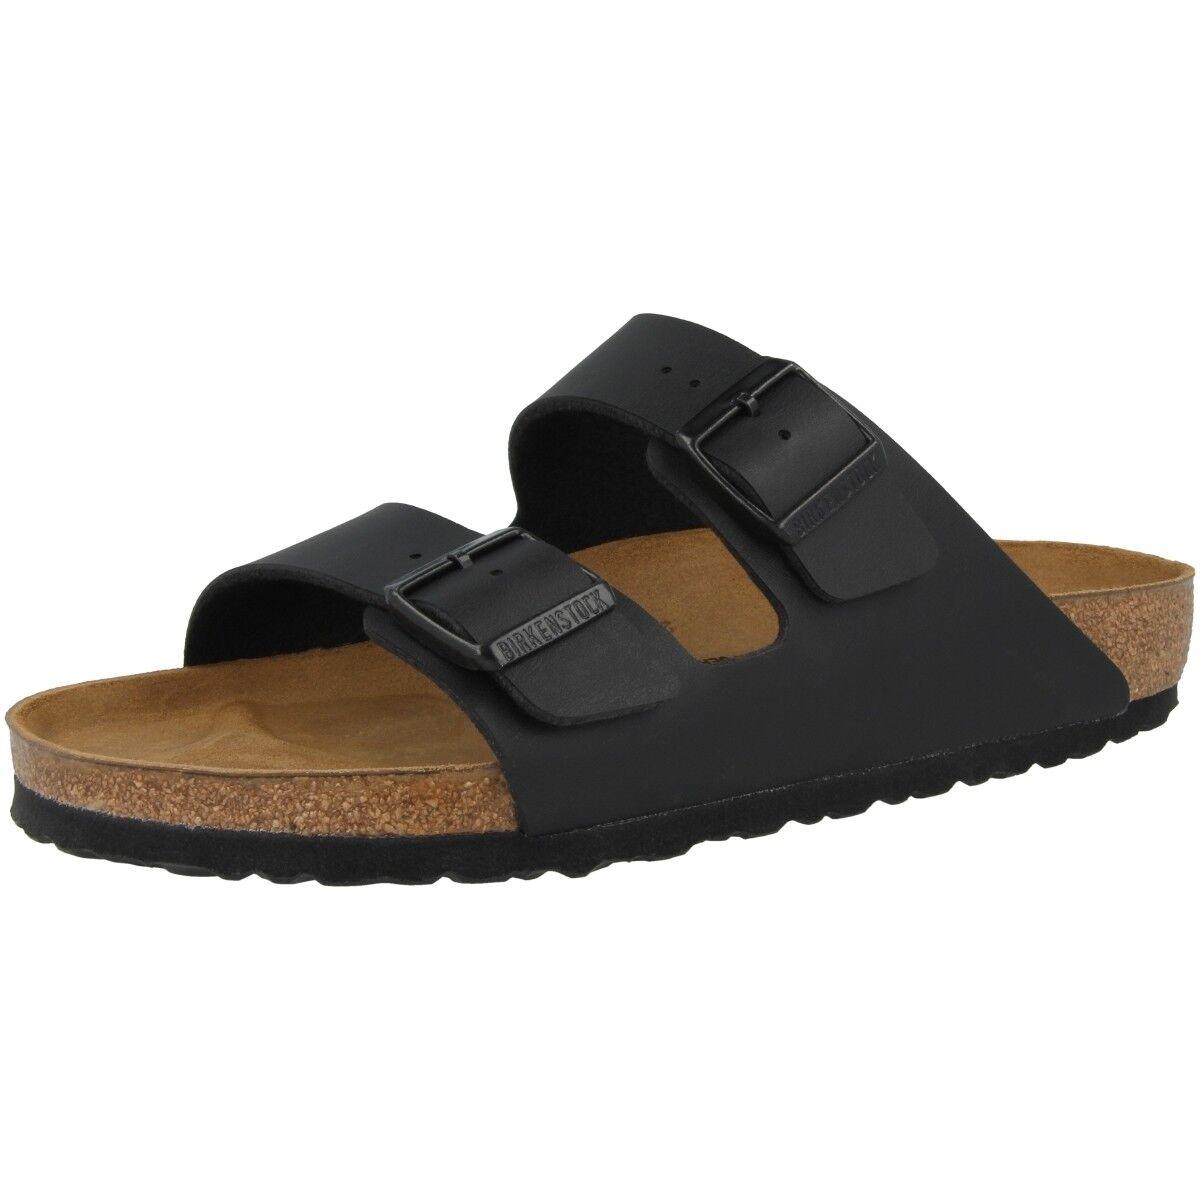 Birkenstock Arizona Birko-Flor Sandalen Schuhe schwarz 051791 Sandalen Birko-Flor Weite normal 52760b